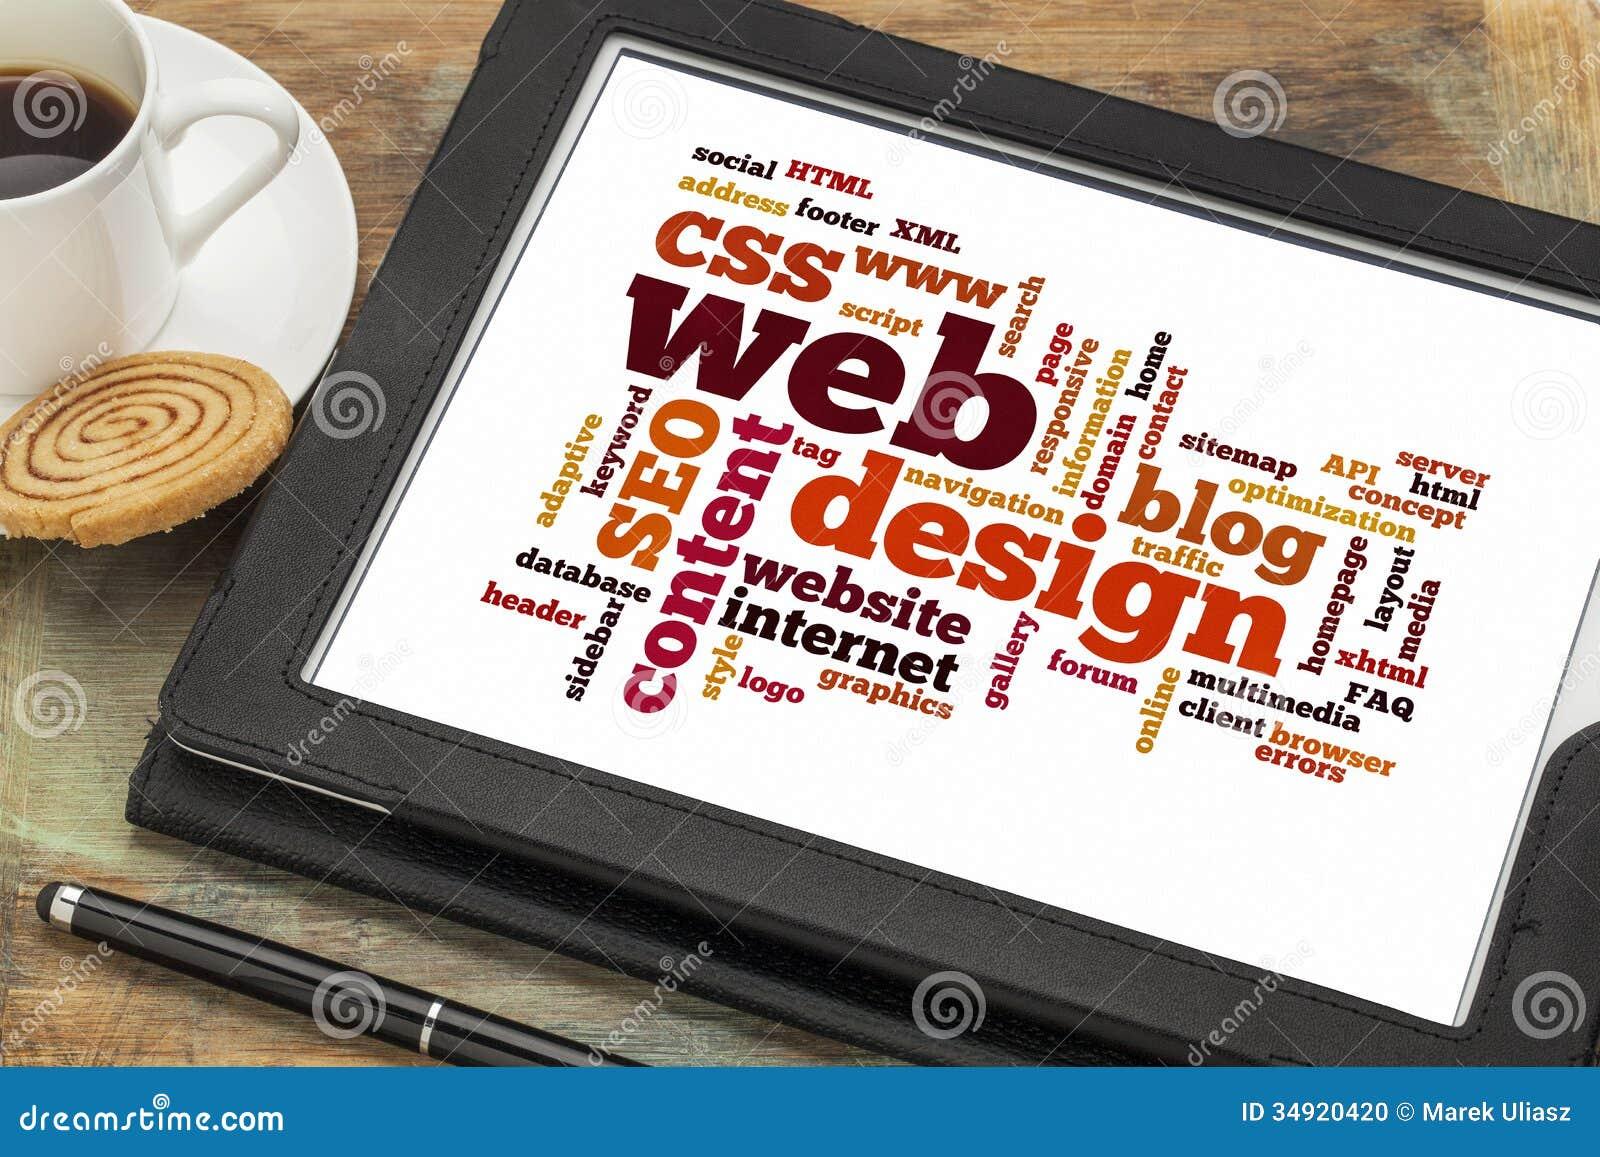 Web design word or tag cloud